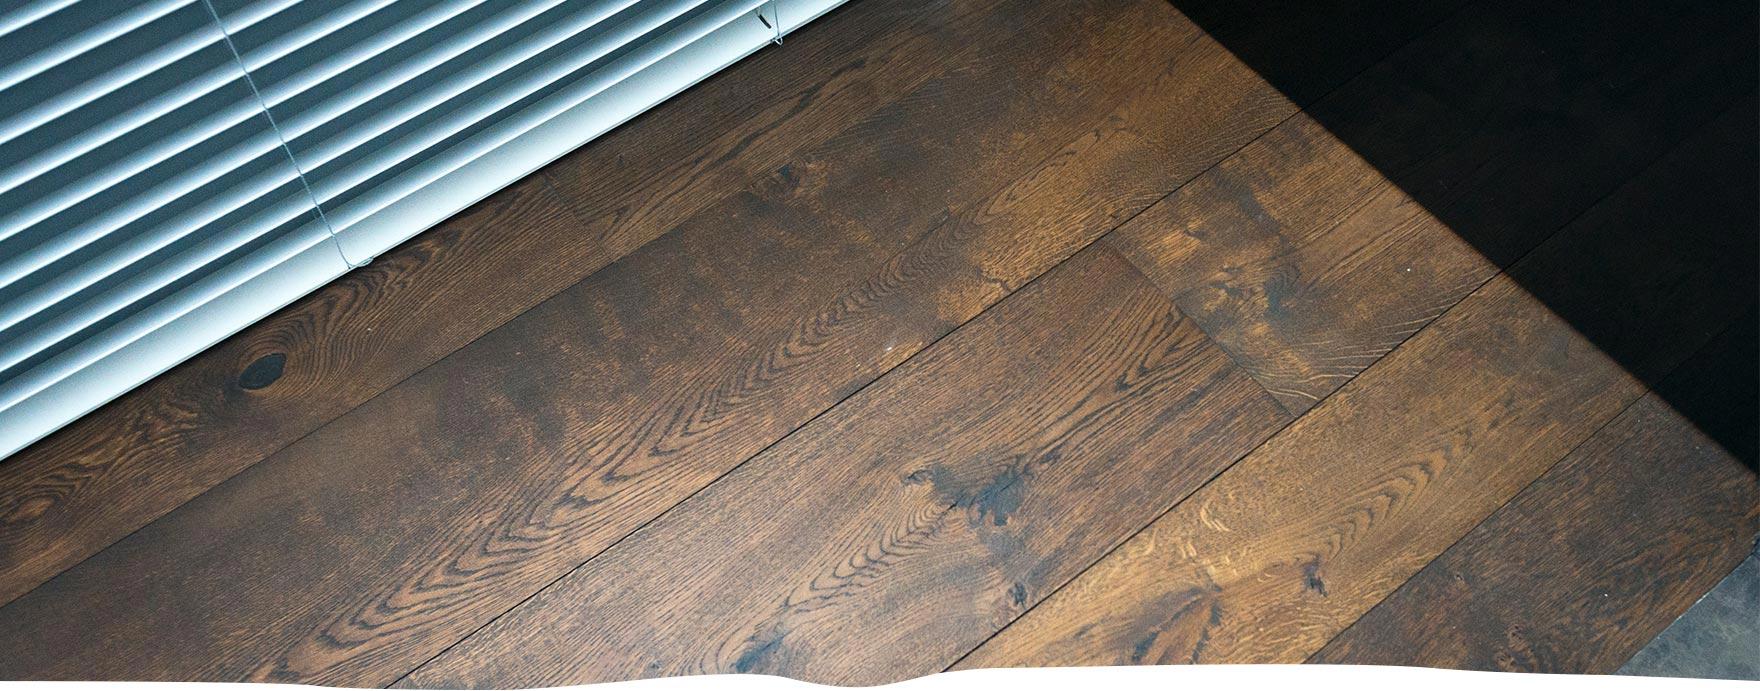 Karaktervolle duoplank vloer met vloerverwarming - De Hout Snip